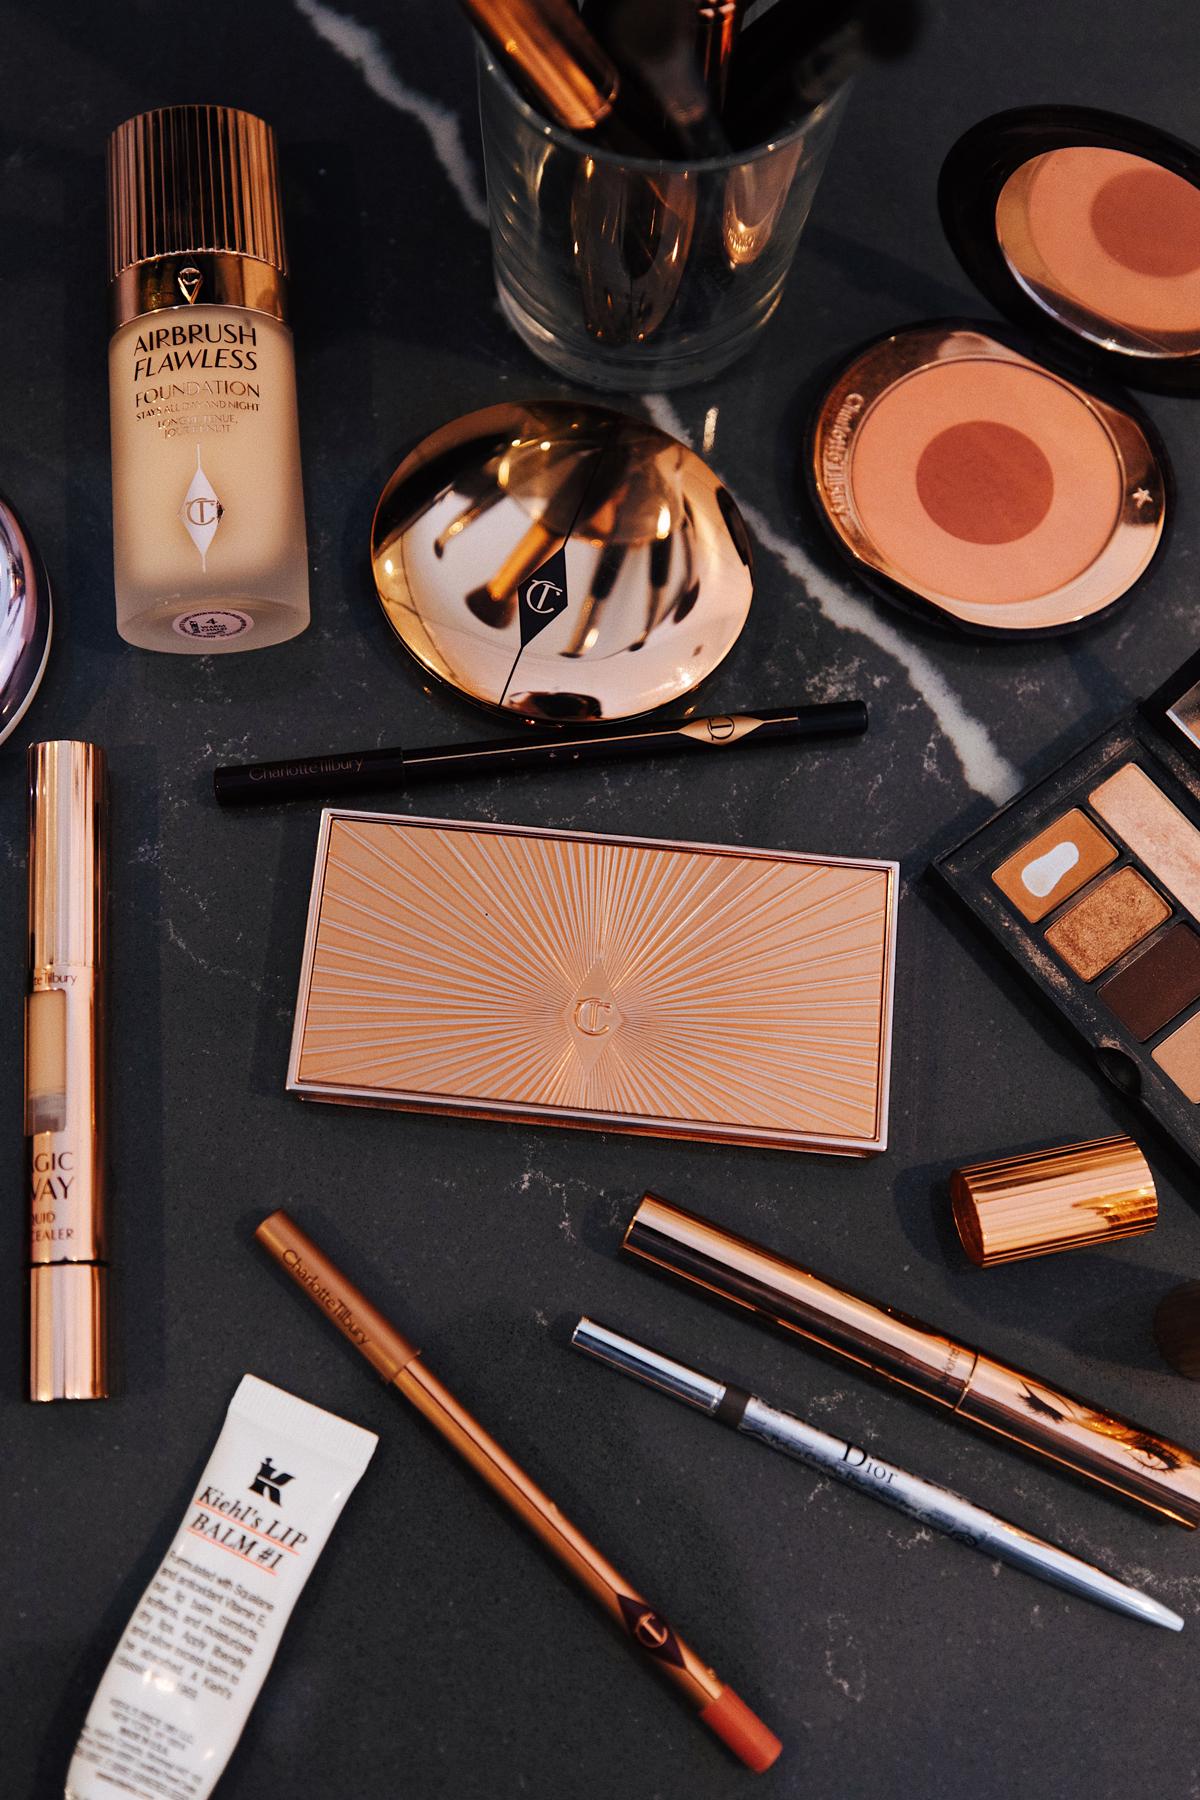 fashion jackson everyday makeup sephora holiday beauty event 2019 charlotte tilbury makeup 1